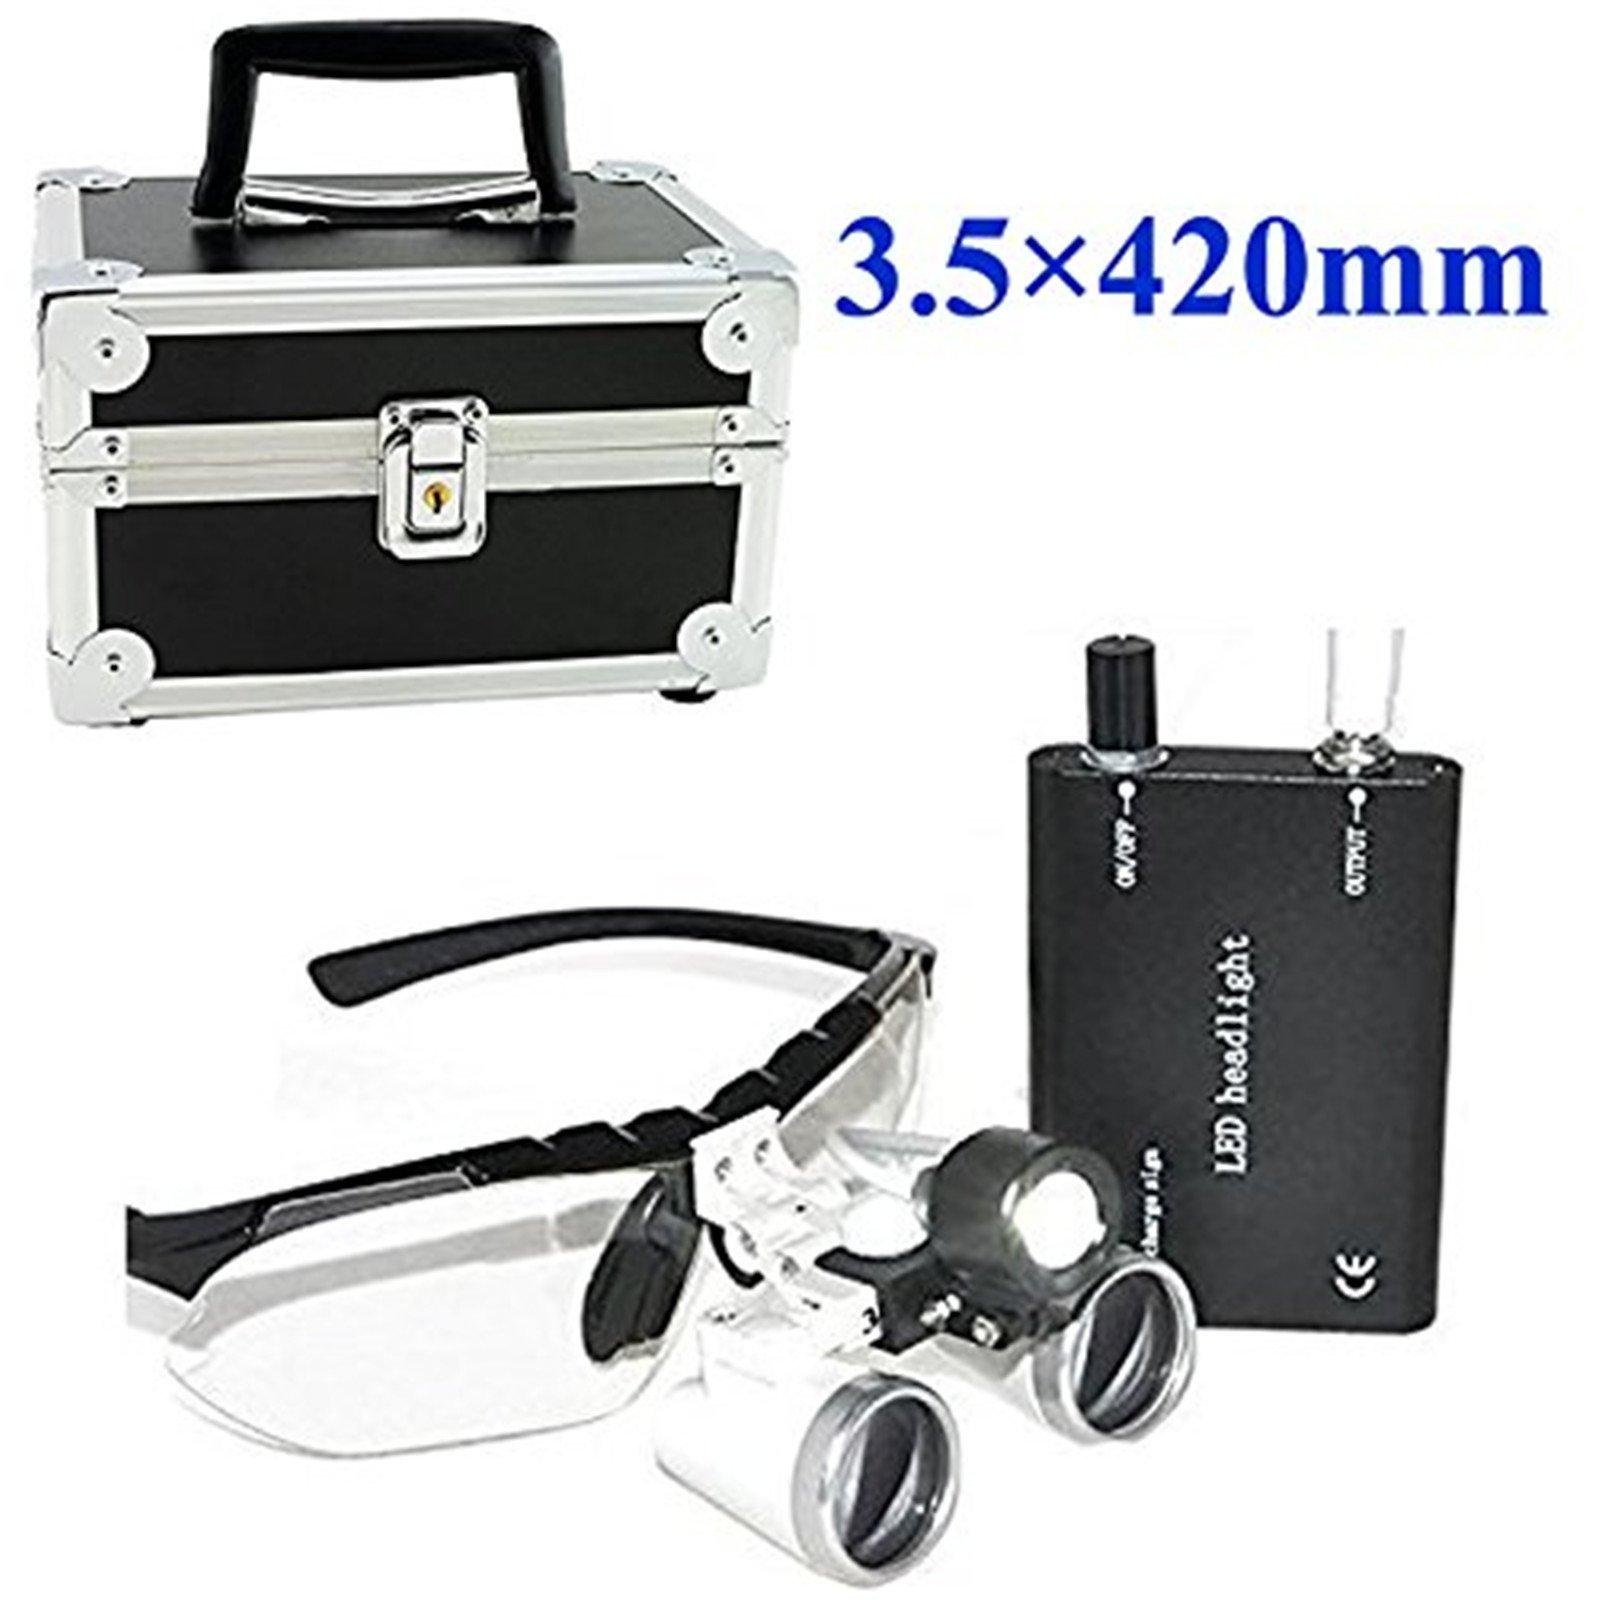 Denshine® Dental Medical Surgical Binocular Loupes Optical Glass Loupe 3.5x 420mm + LED Head Light Lamp + + Aluminum Case